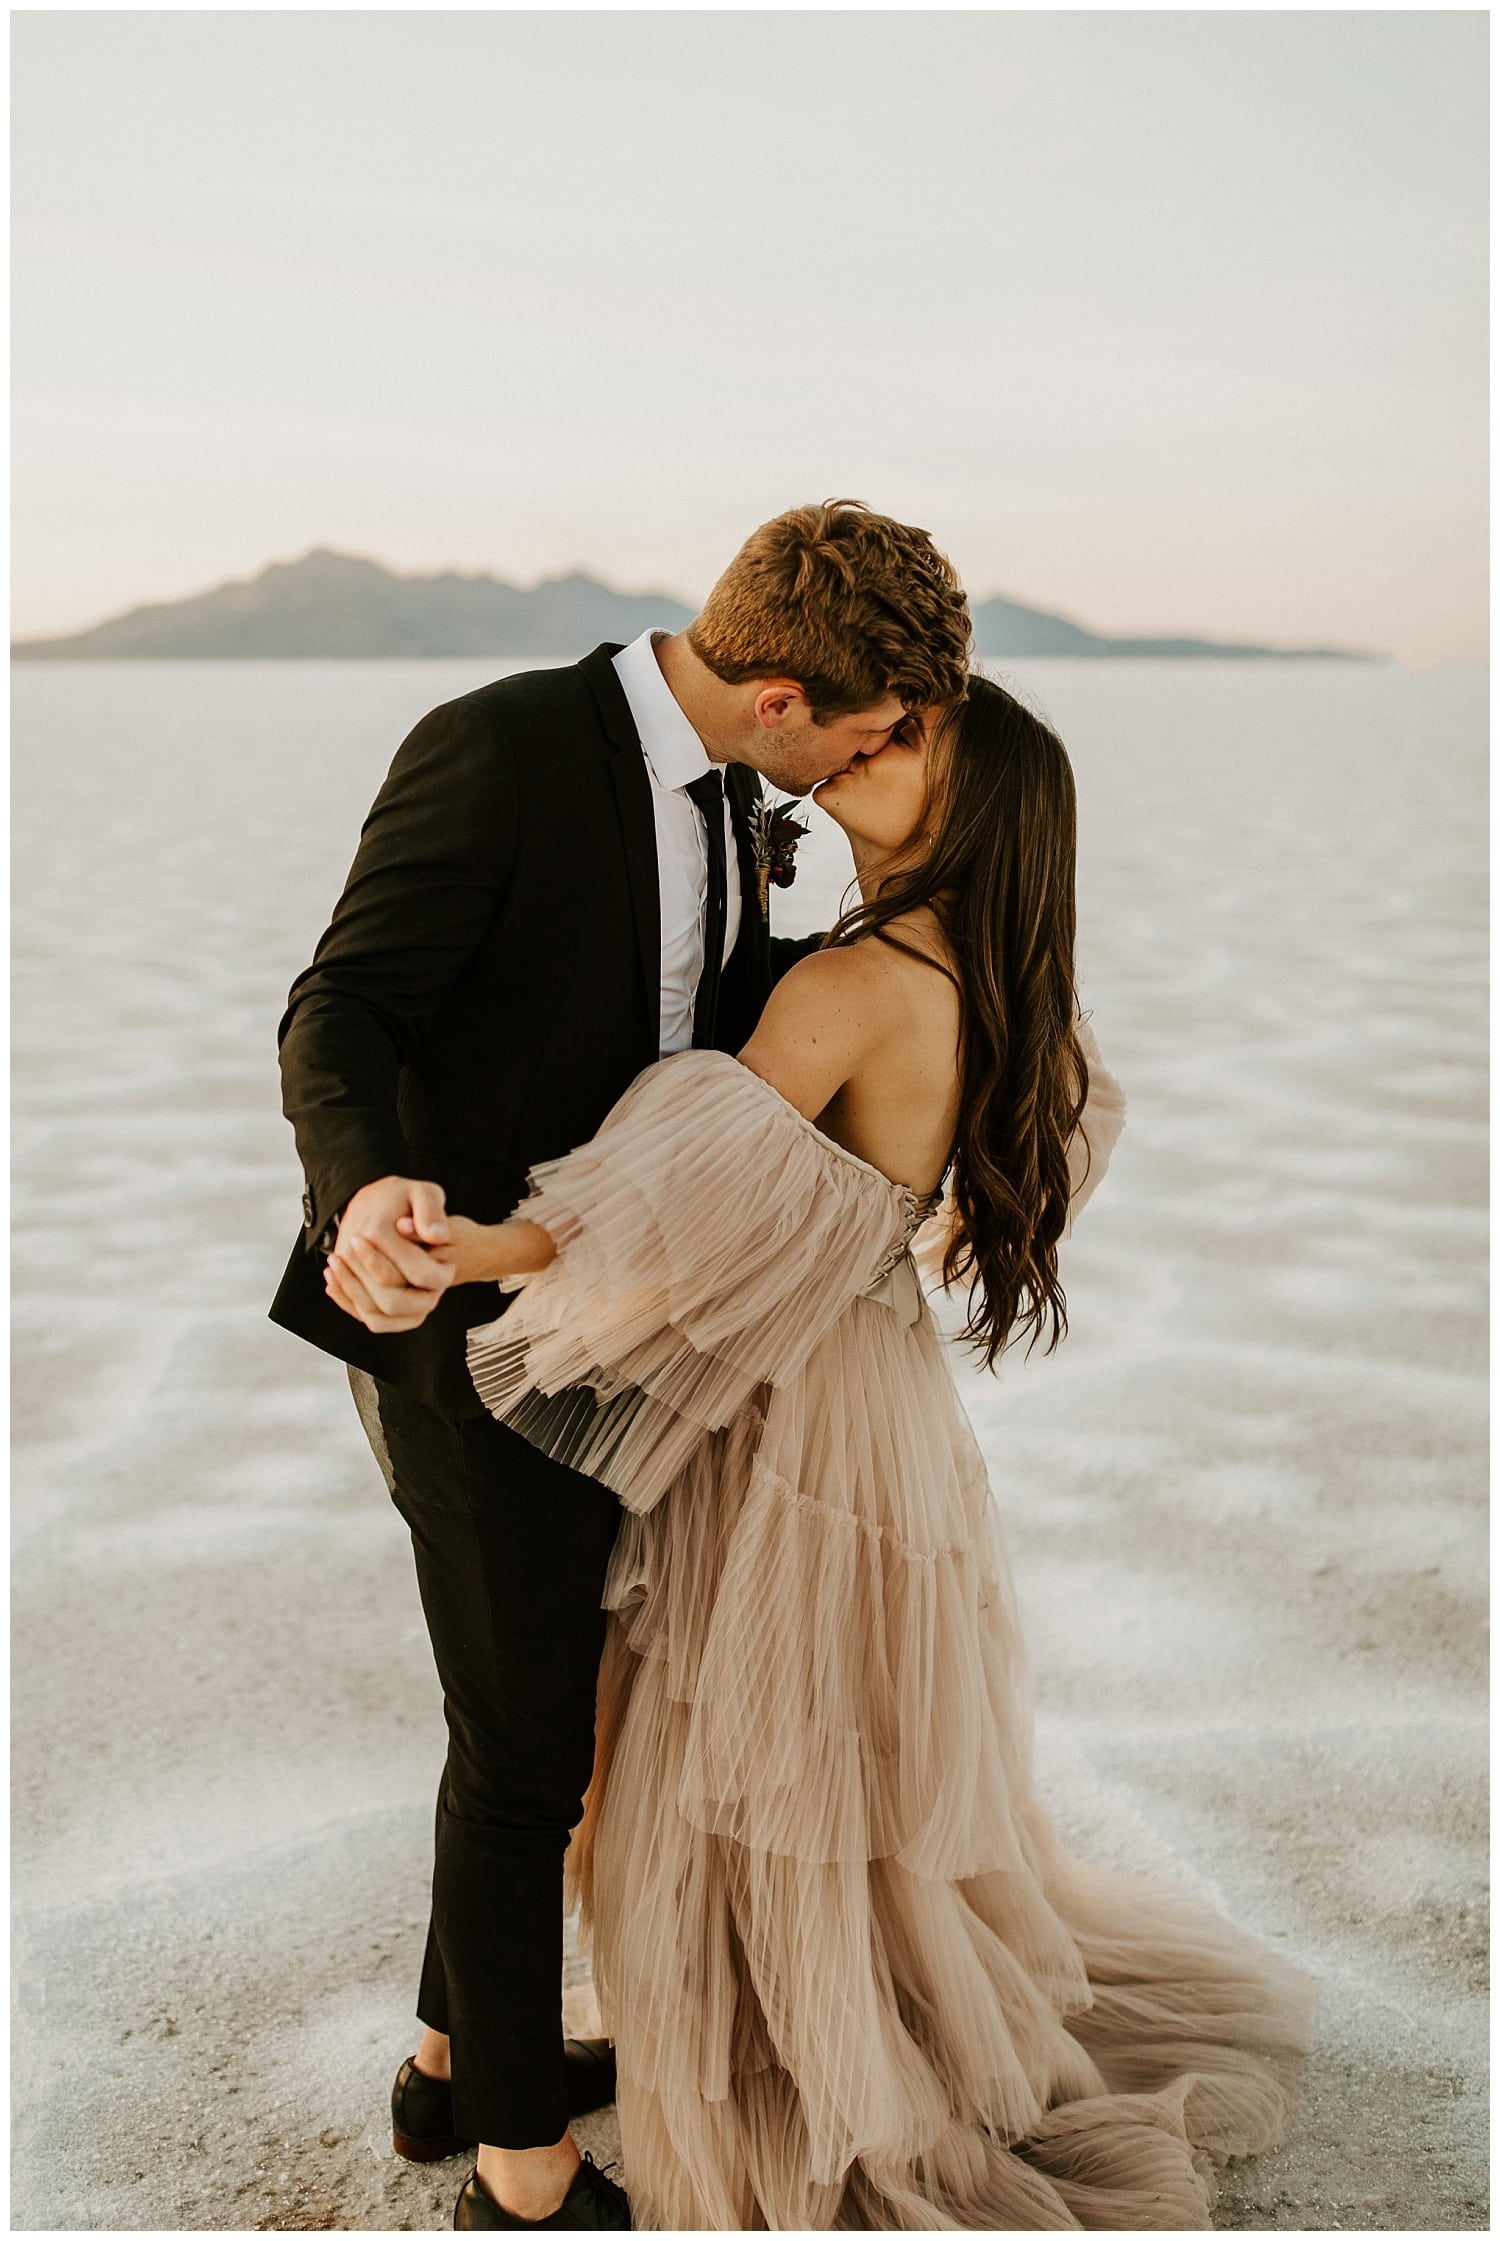 bonneville salt flats elopement, photographers in salt lake city, utah wedding photographers